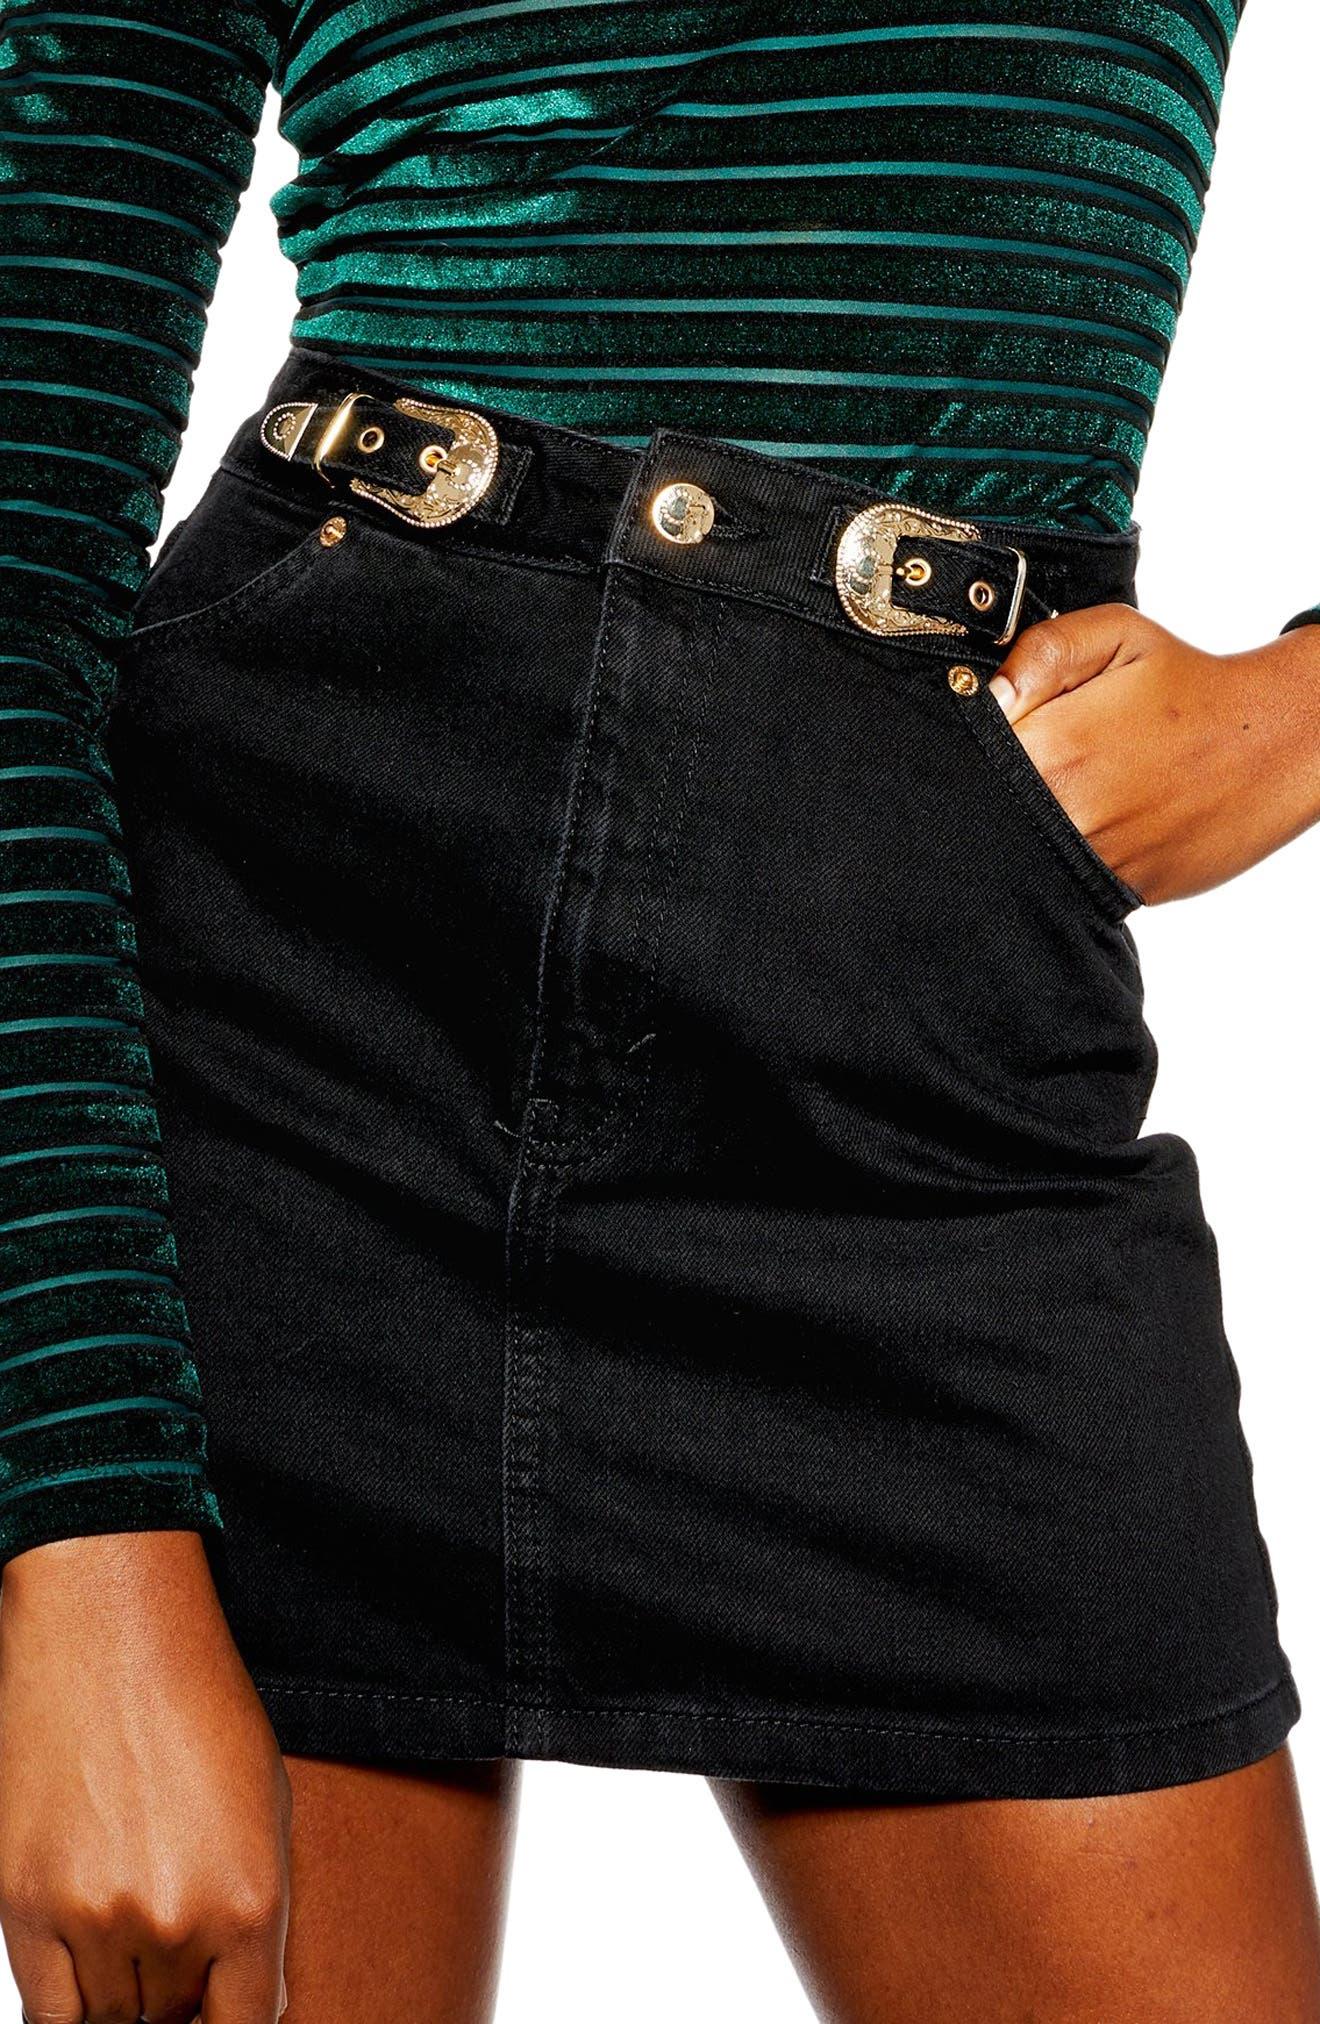 Topshop Buckle Denim Skirt, US (fits like 0) - Black